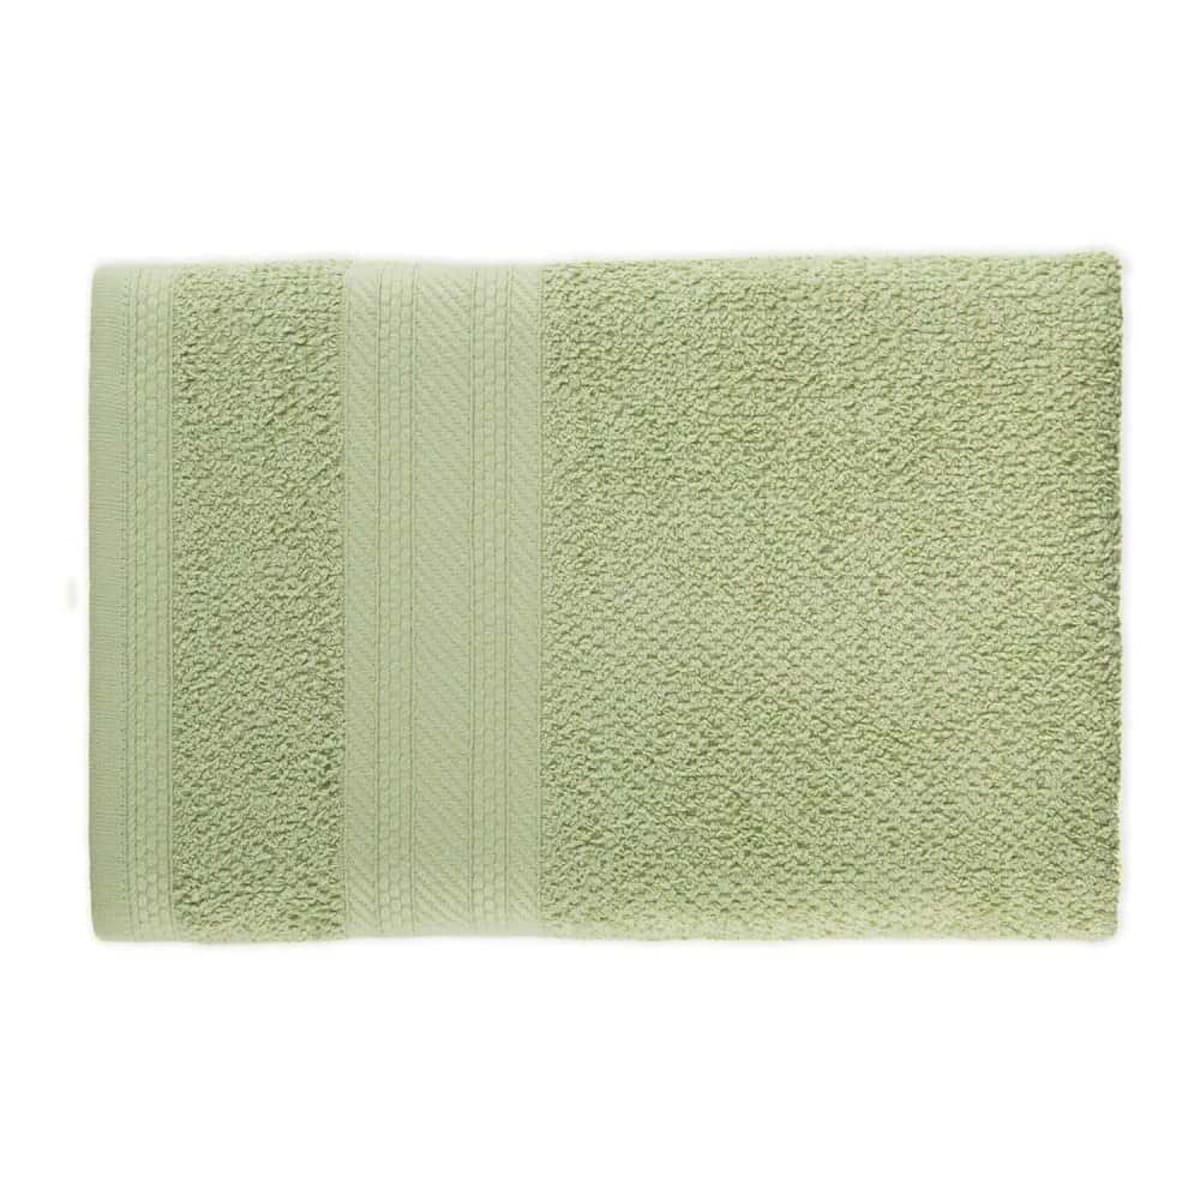 Toalha rosto empire 48x70 Verde Folha